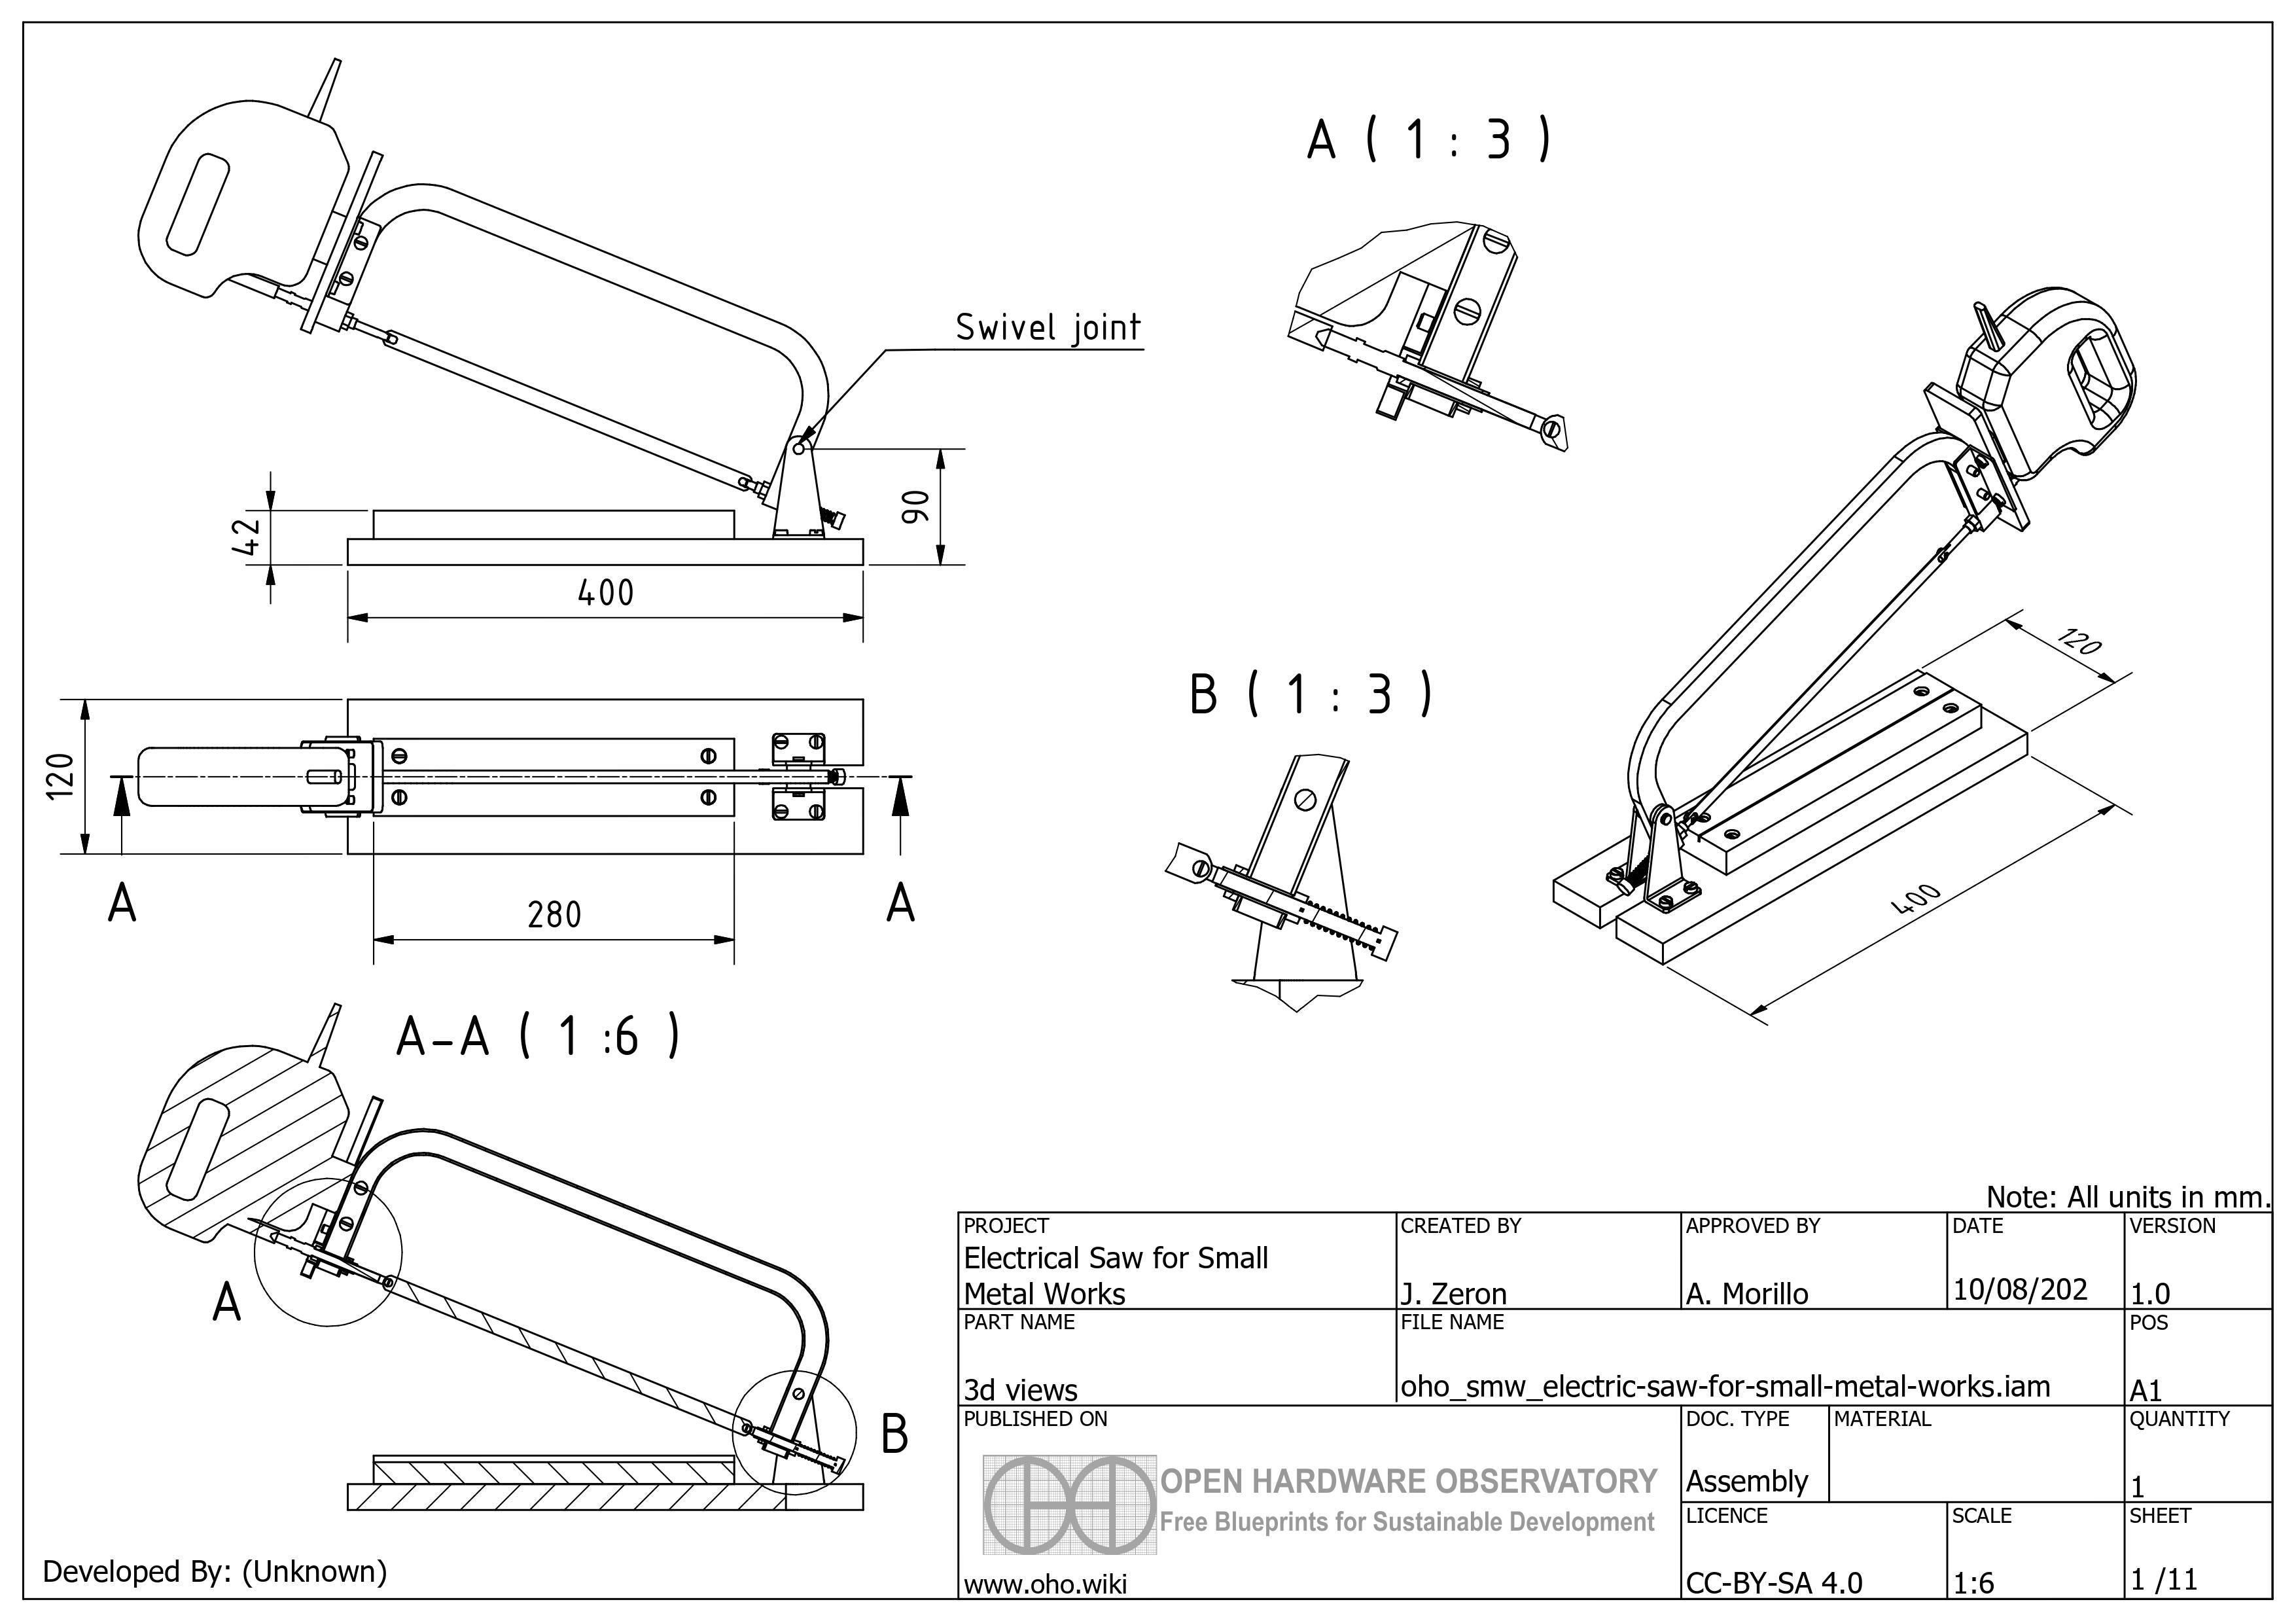 Oho smw electric-saw-for-small-metal-works 0001.jpg